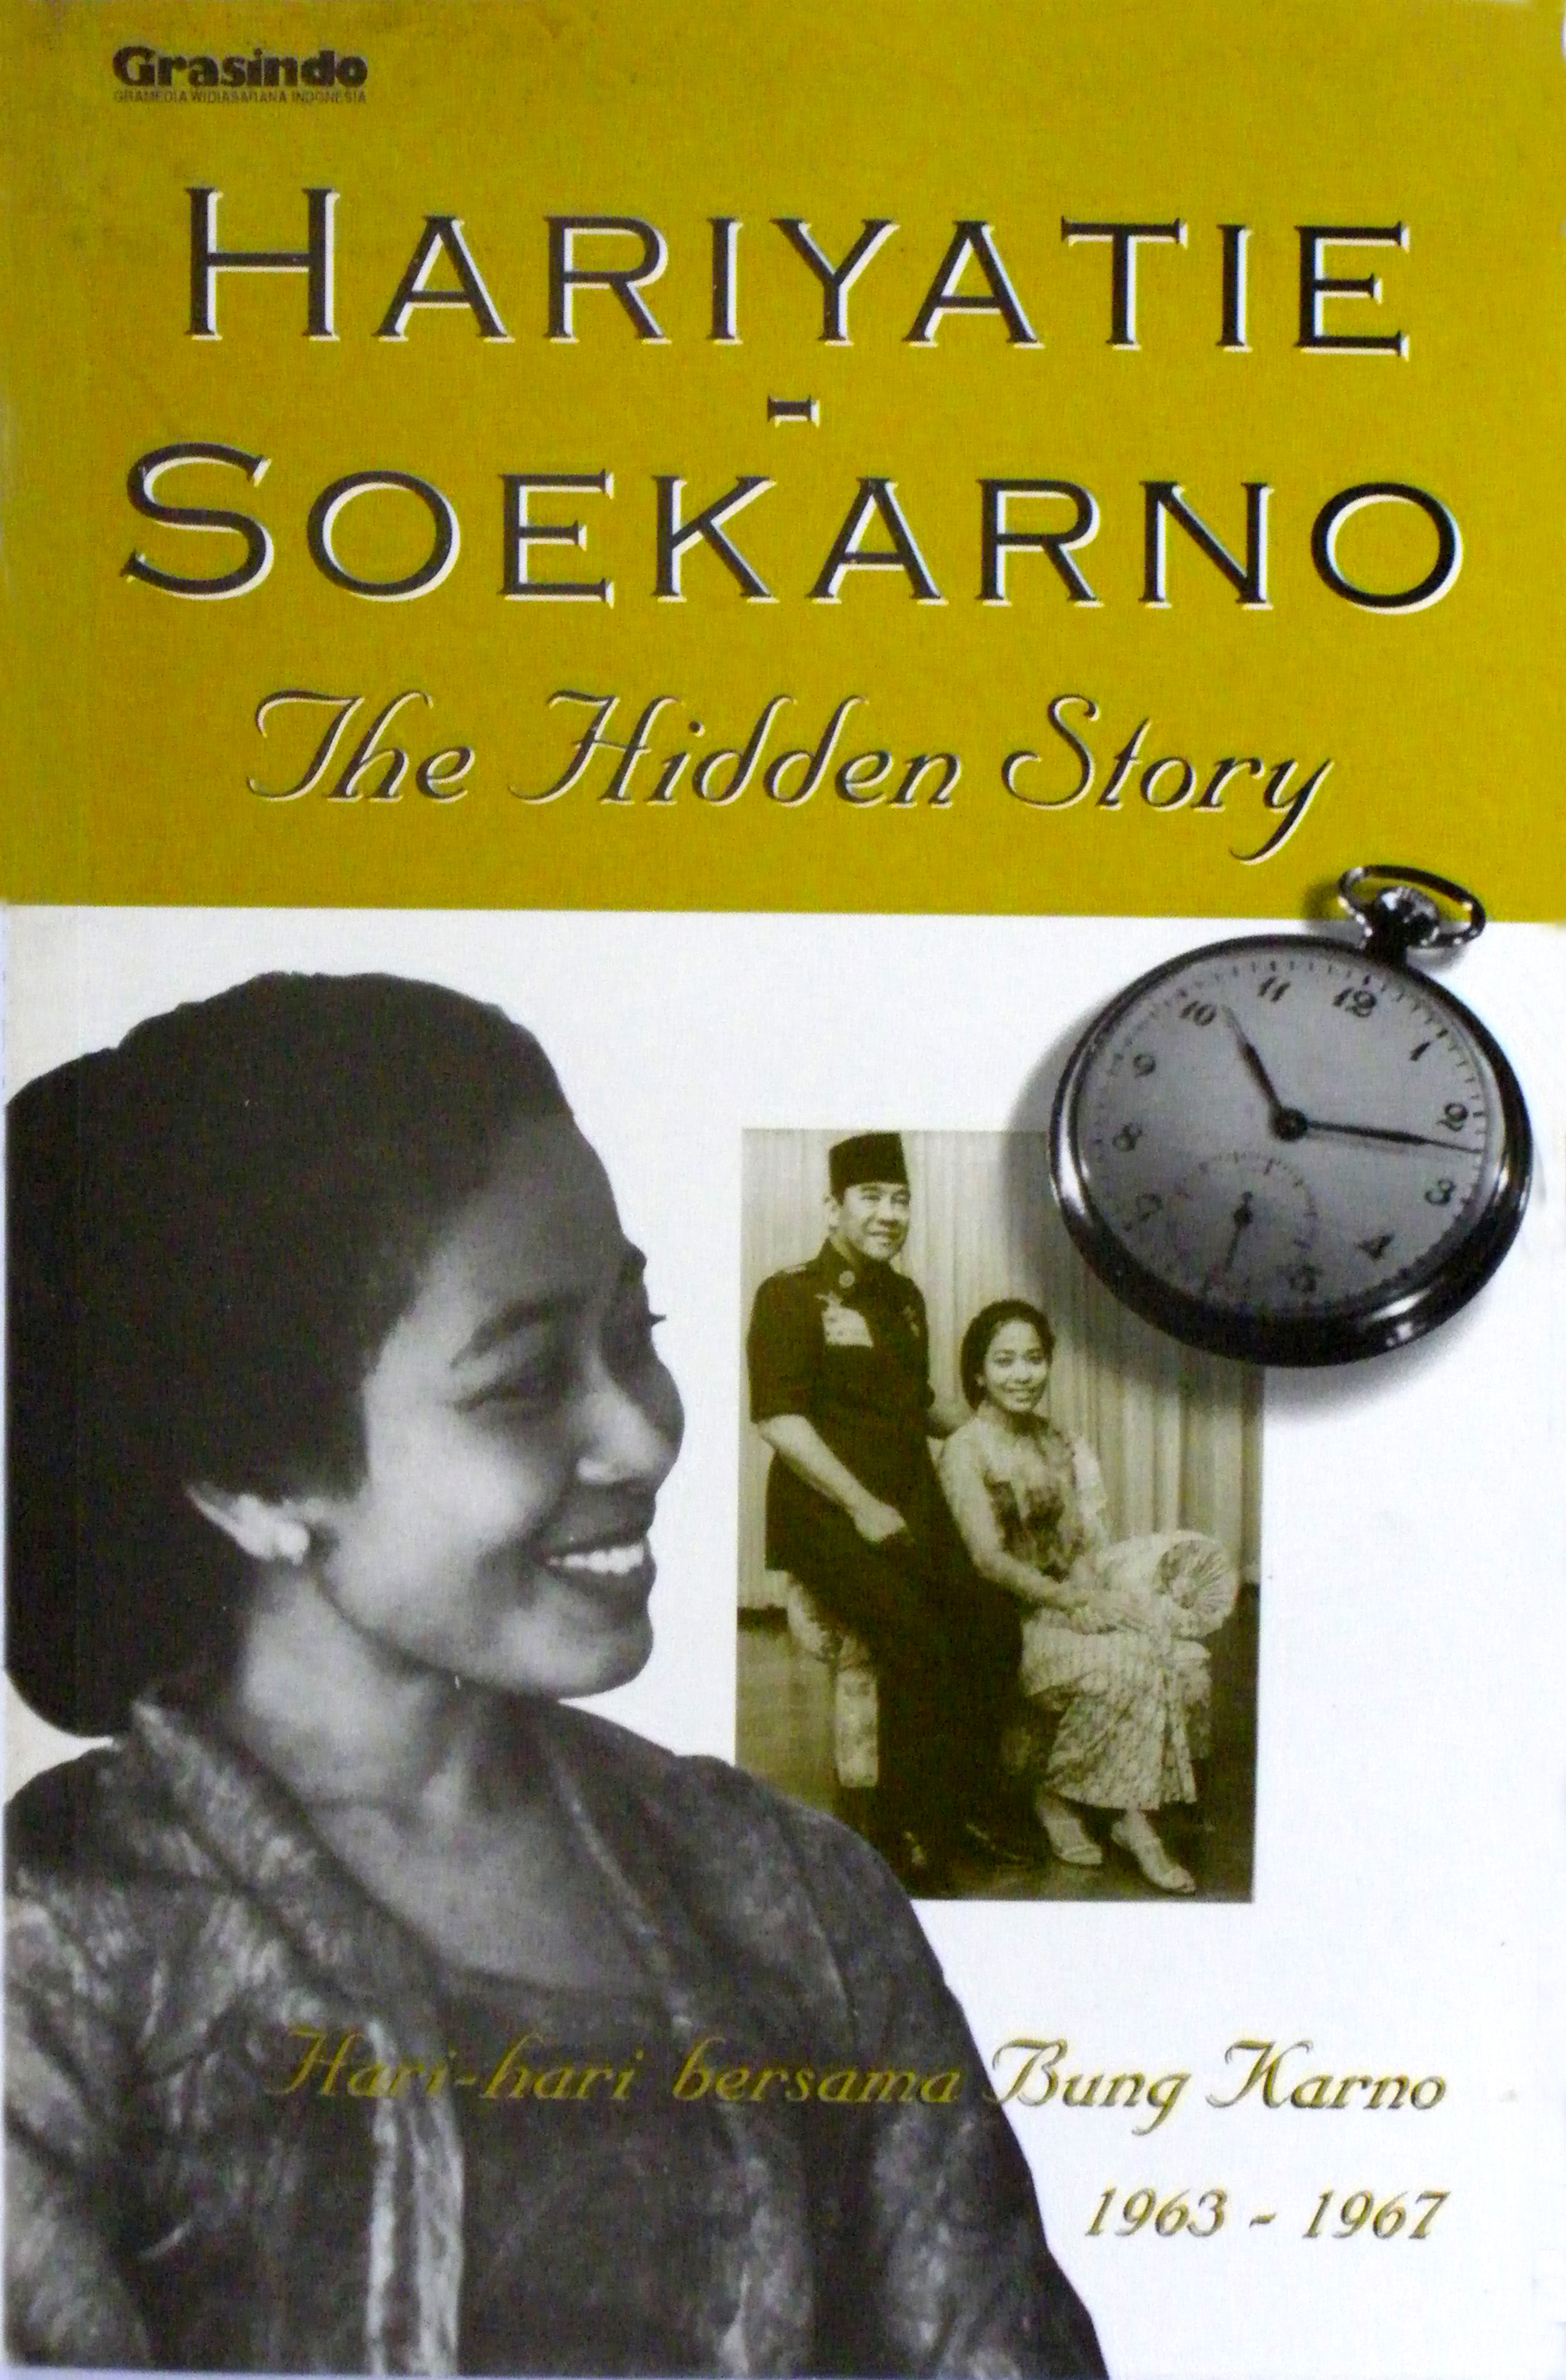 Hariyatie Soekarno | ROSO DARAS